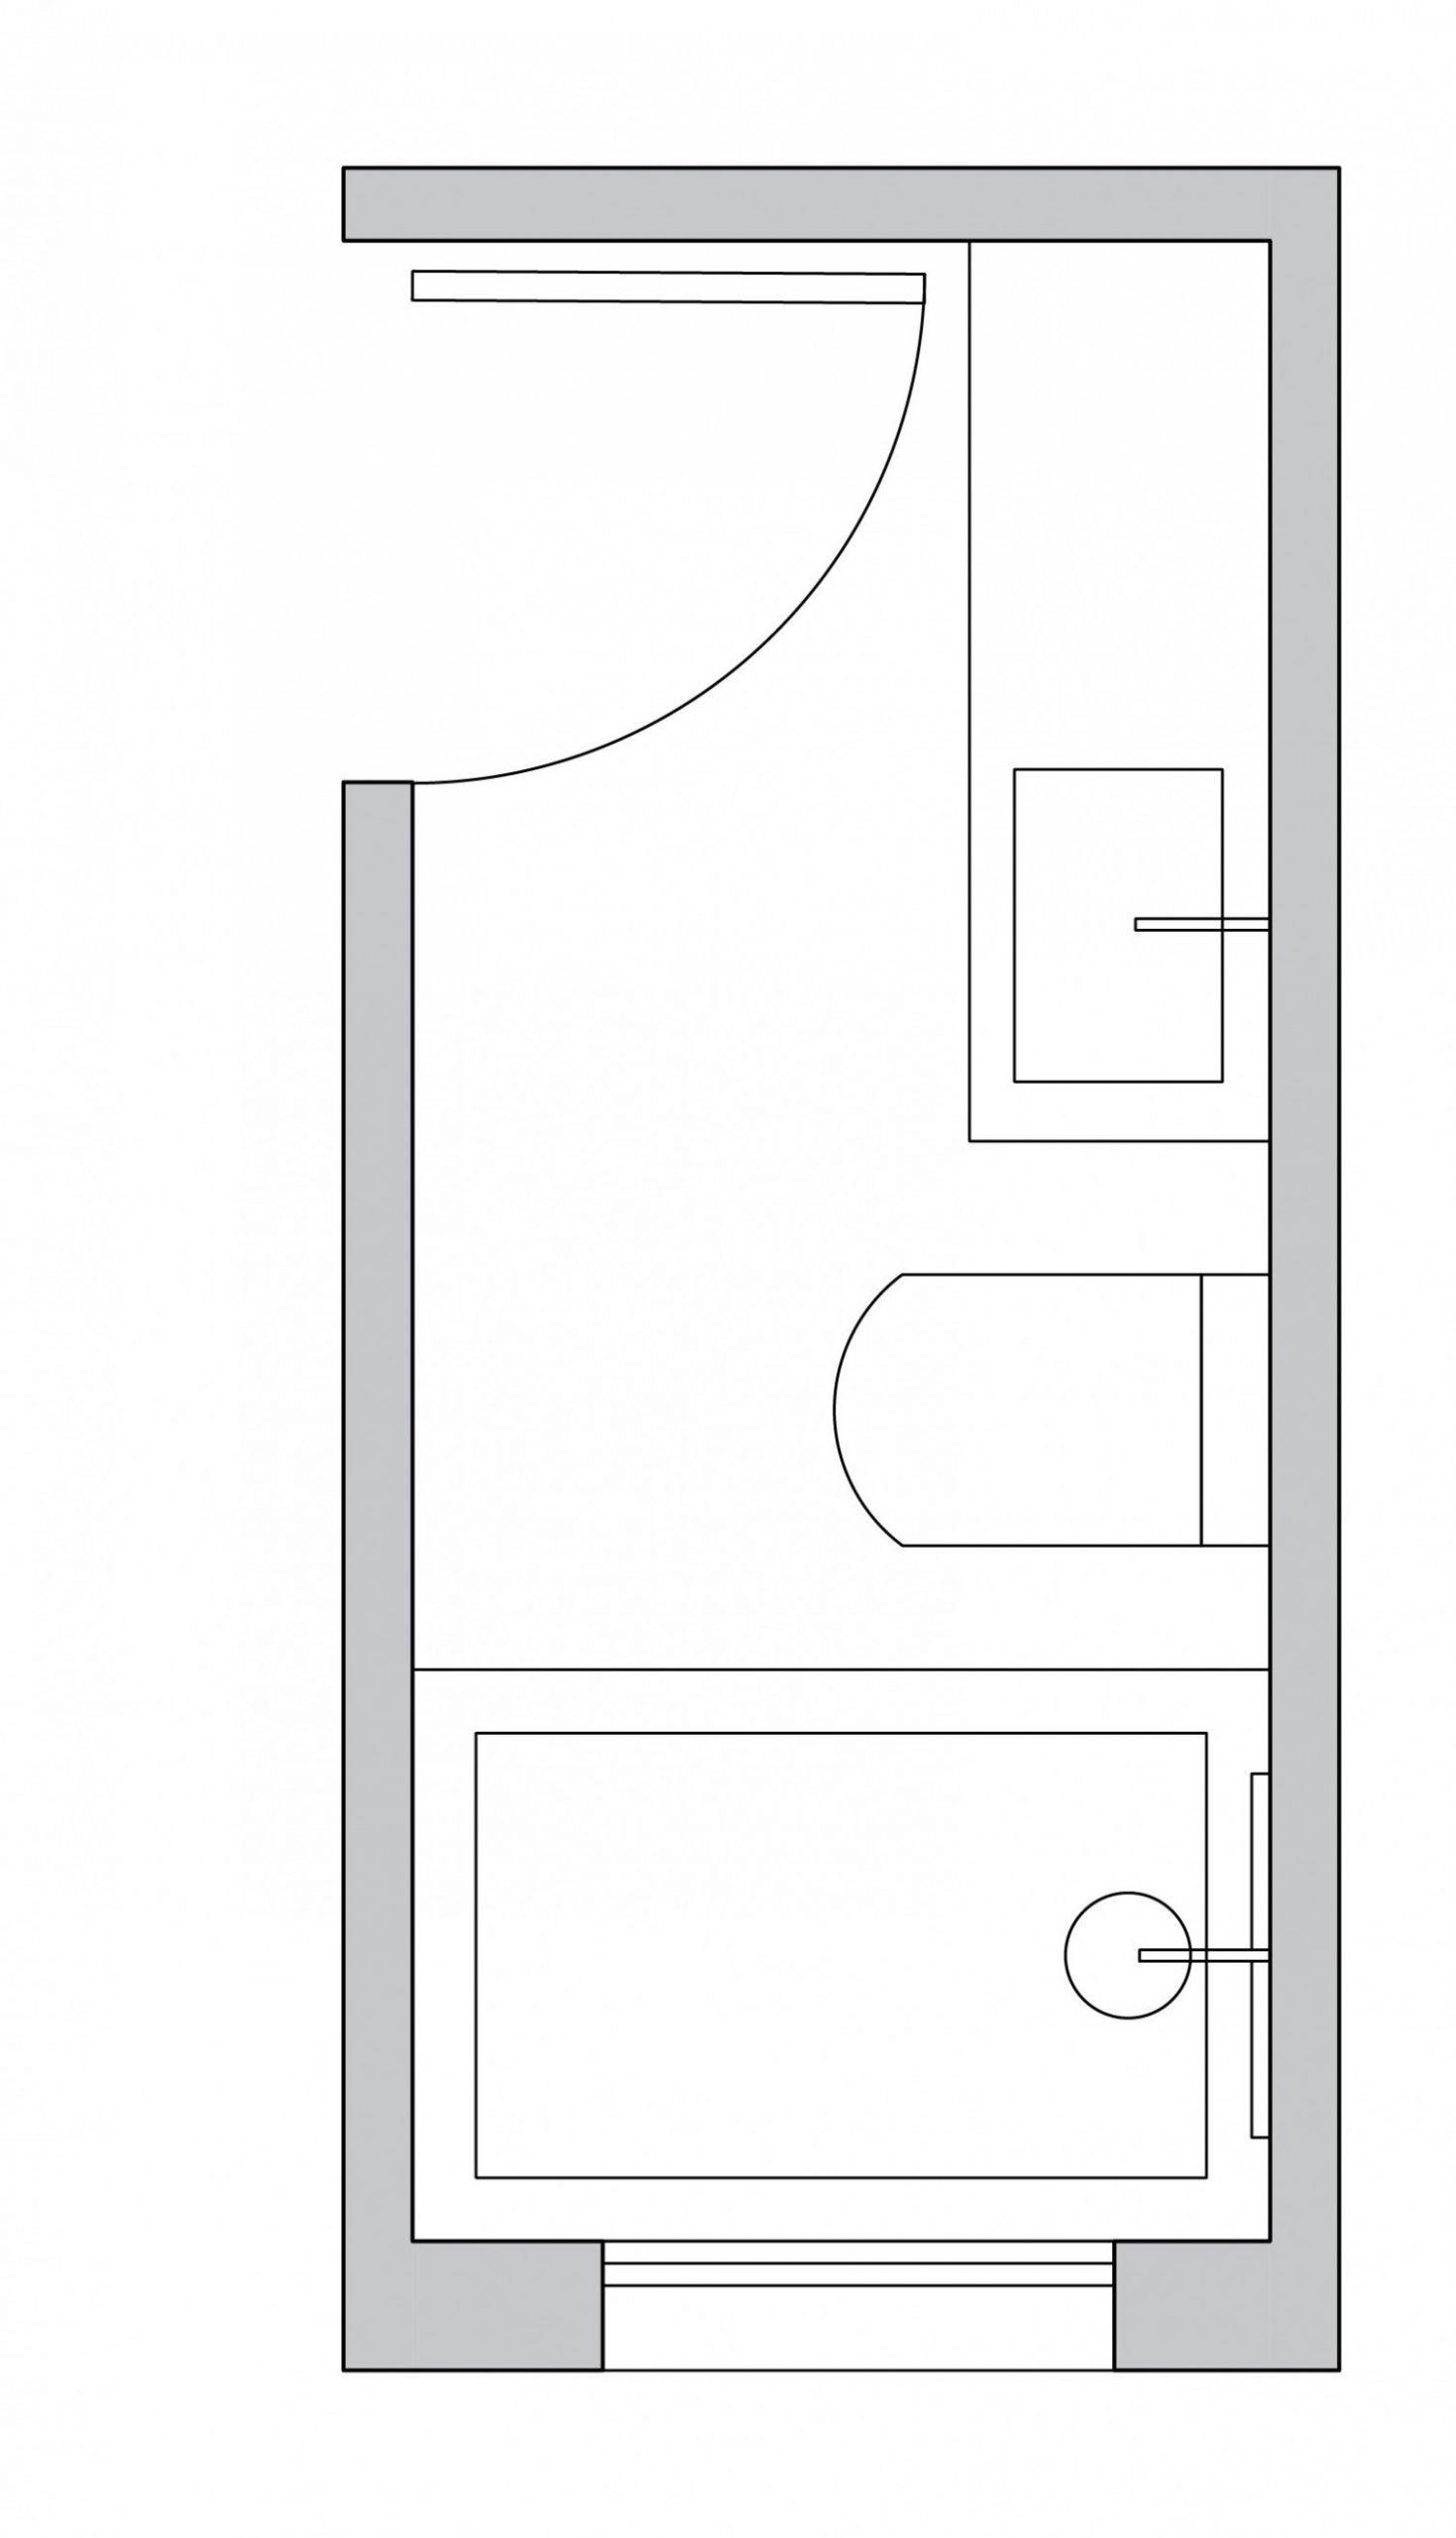 Small Bathroom Design Floor Plans Kamar Mandi Mewah Kamar Mandi Kecil Kamar Mandi